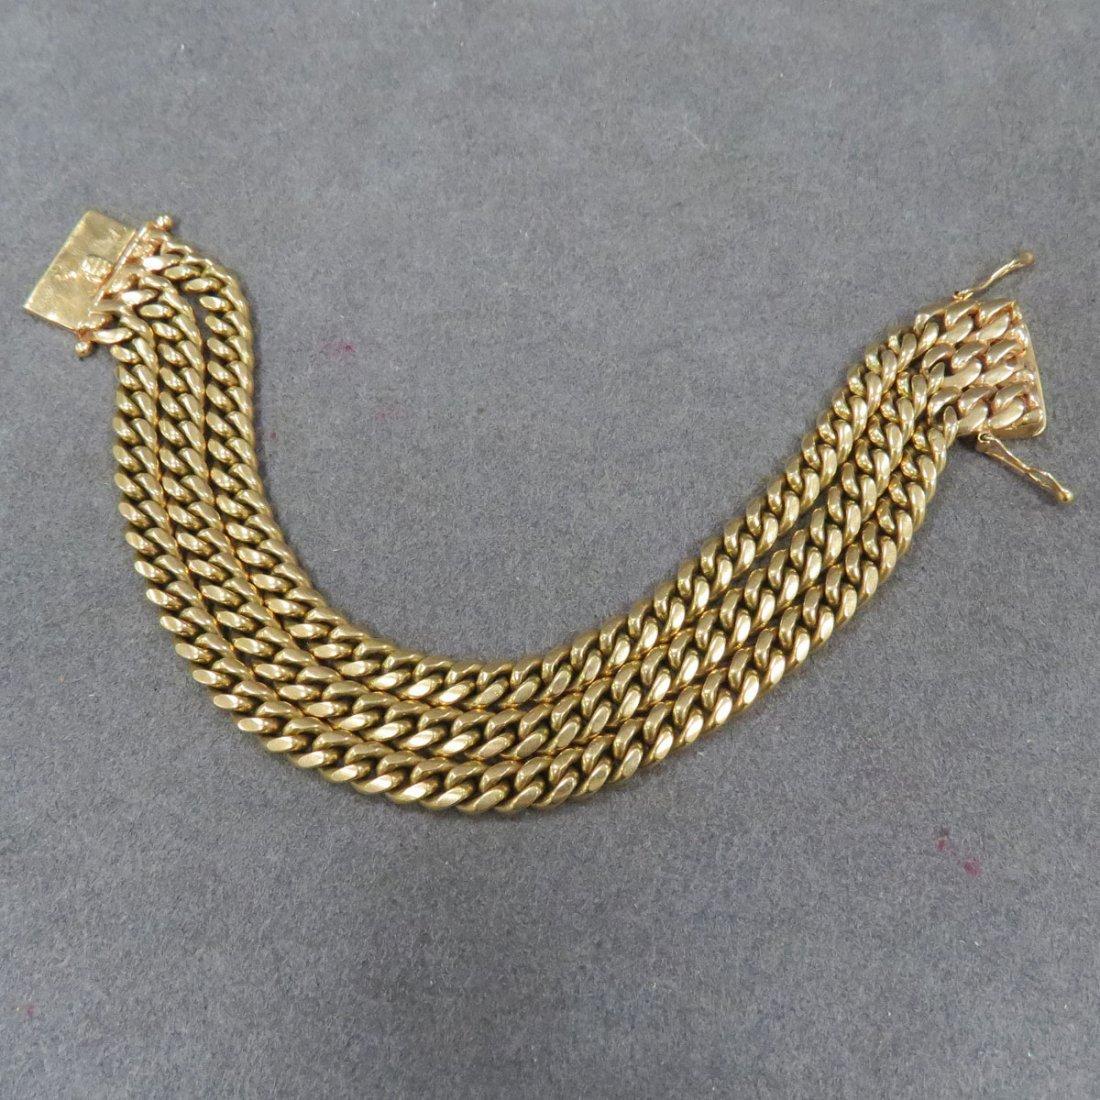 14K YELLOW GOLD MULTI-CHAIN BRACELET